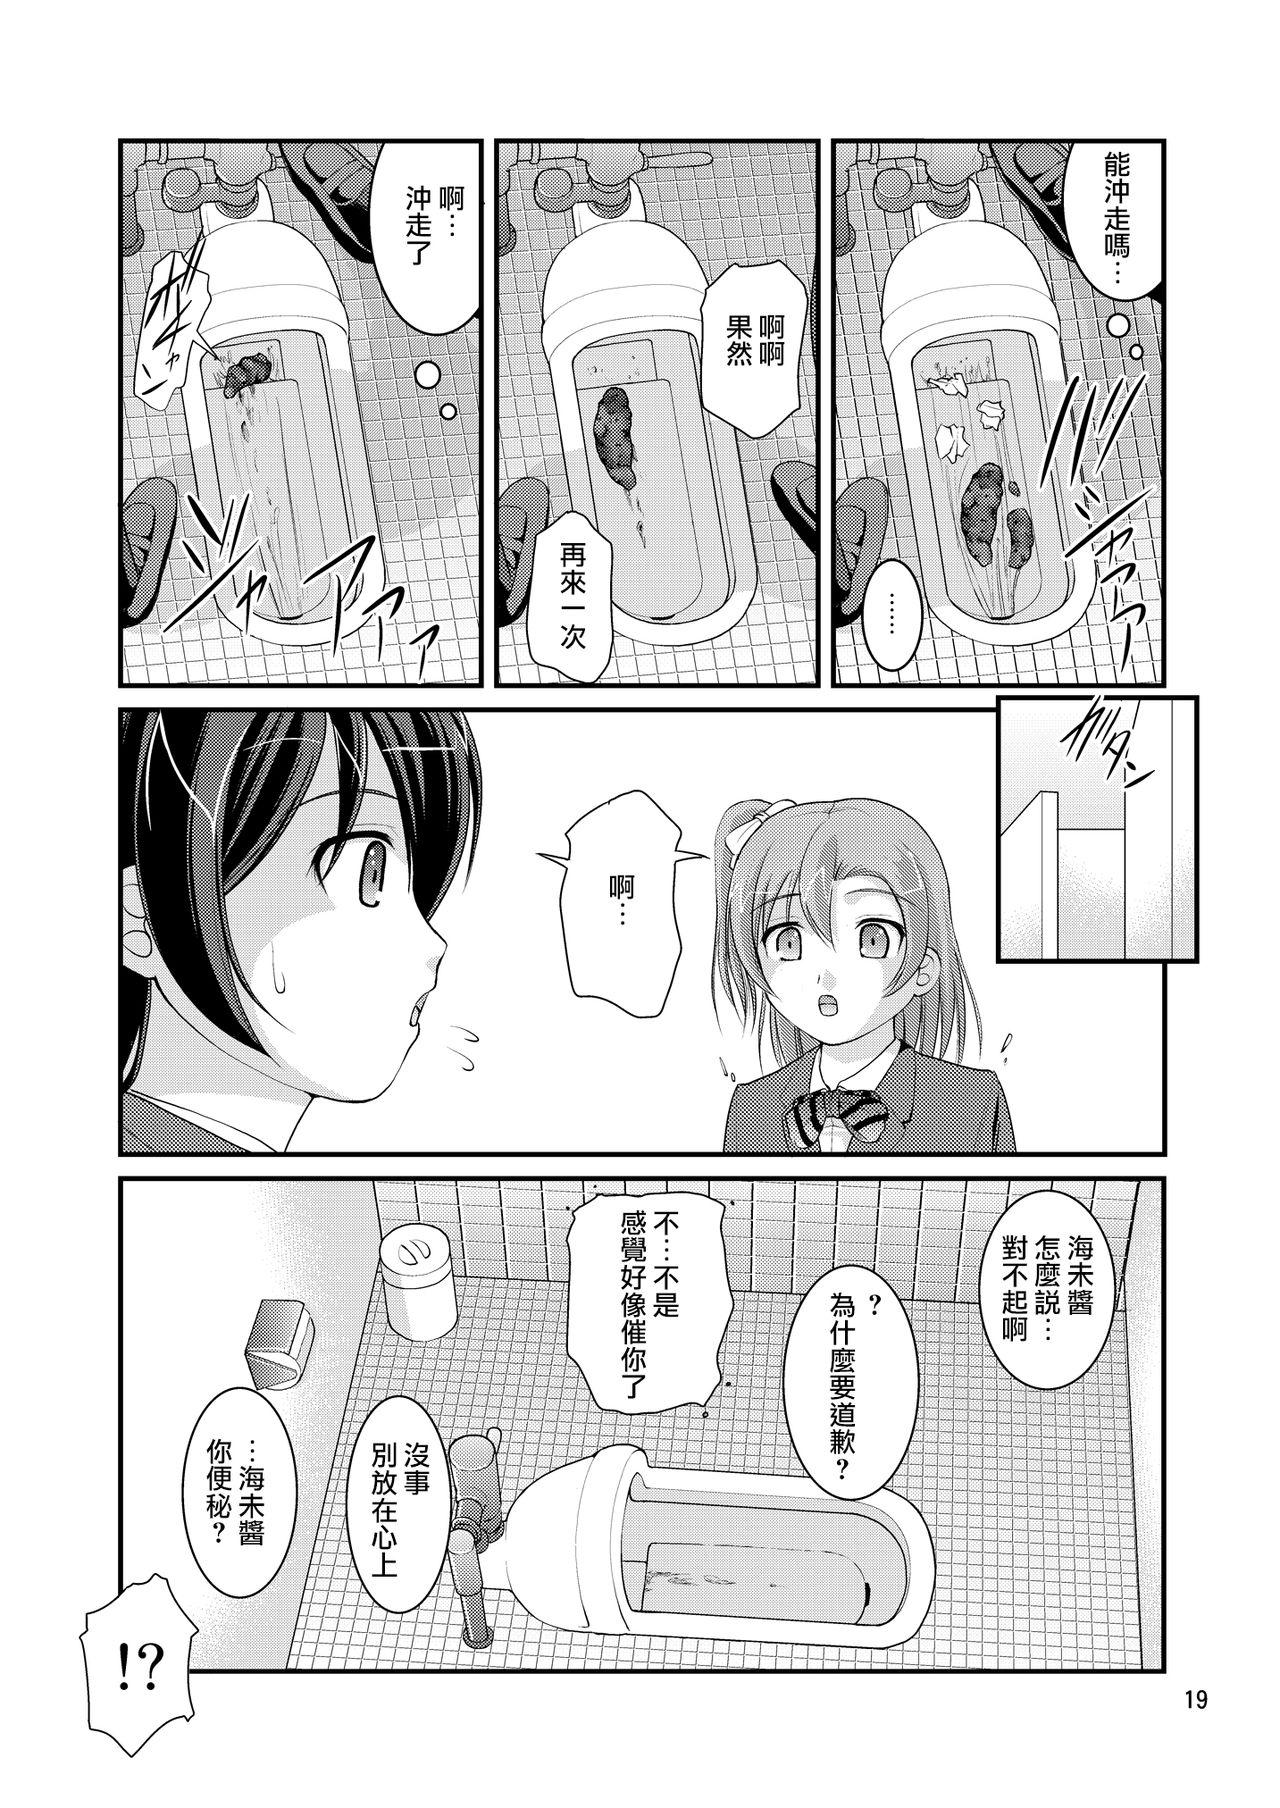 Bou Ninki School Idol Toilet Tousatsu vol. 1   某人氣學園偶像 廁所盜攝 Vol. 1 16